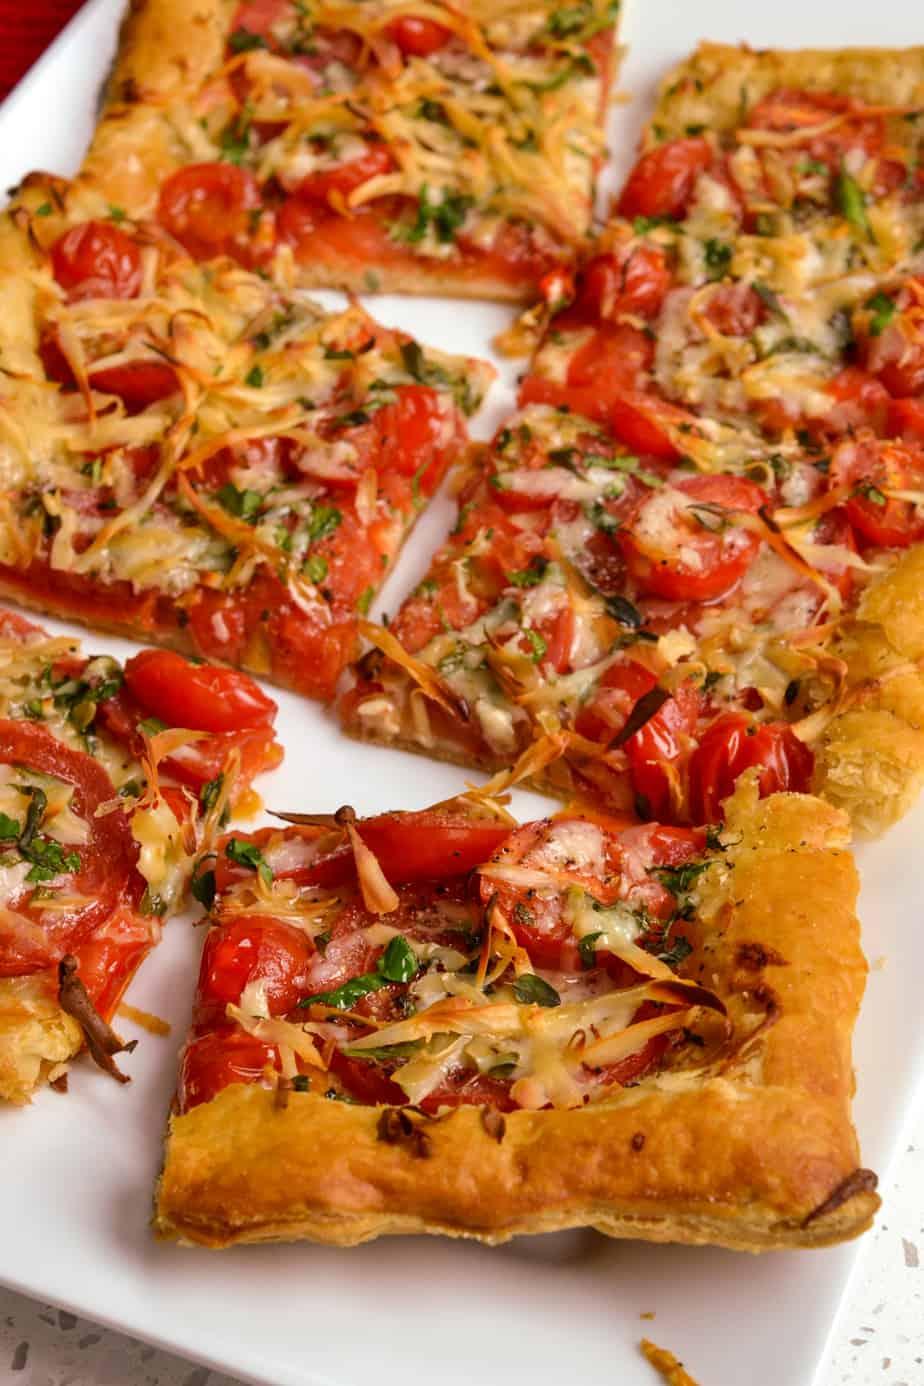 Sliced tomato tart with fresh herbs